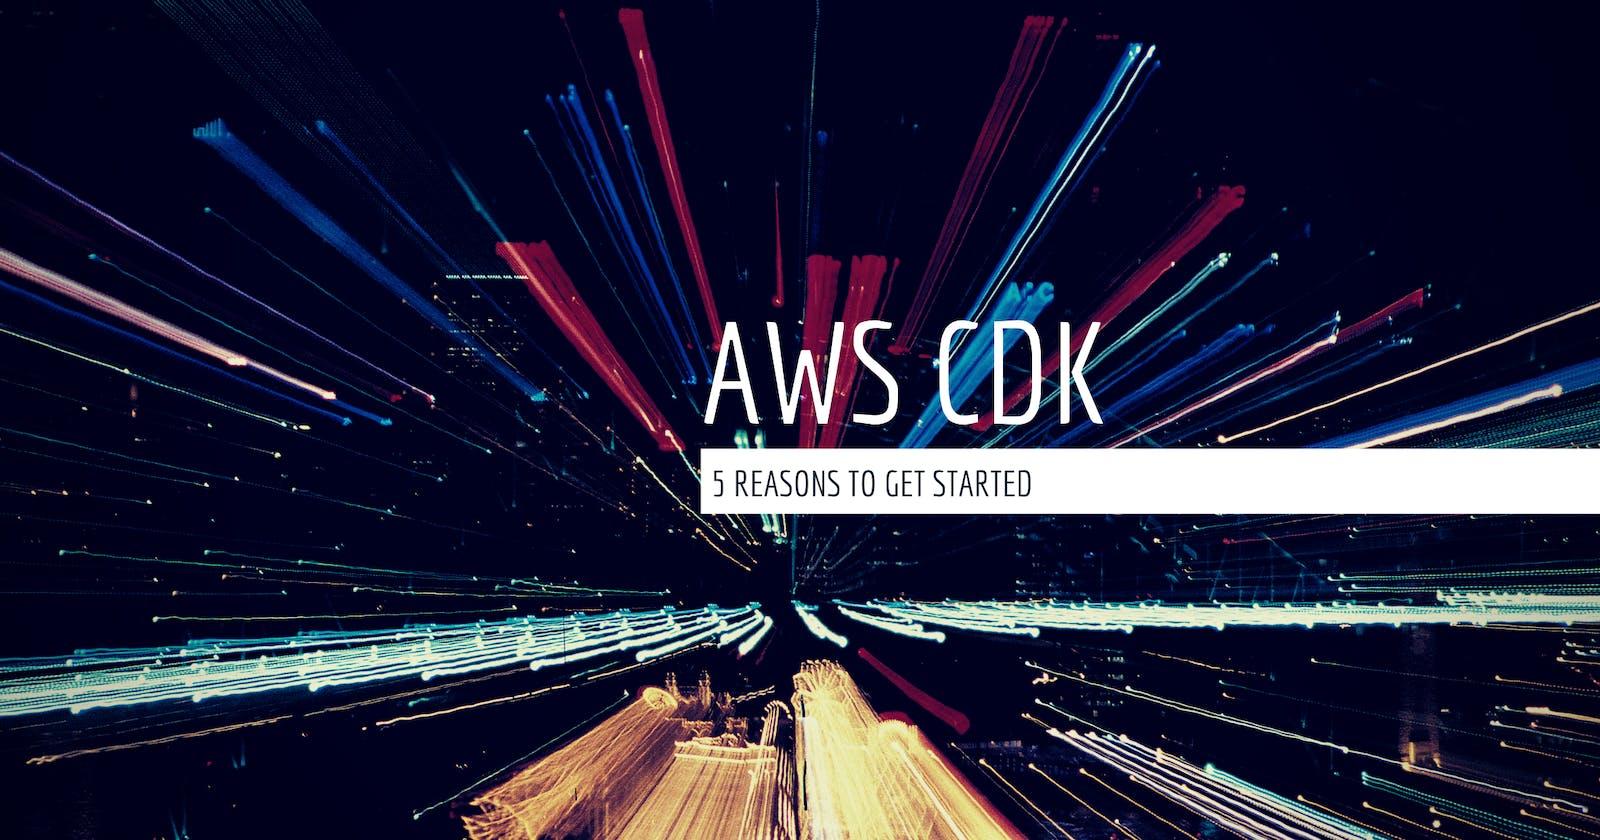 5 Reasons to Use AWS CDK!